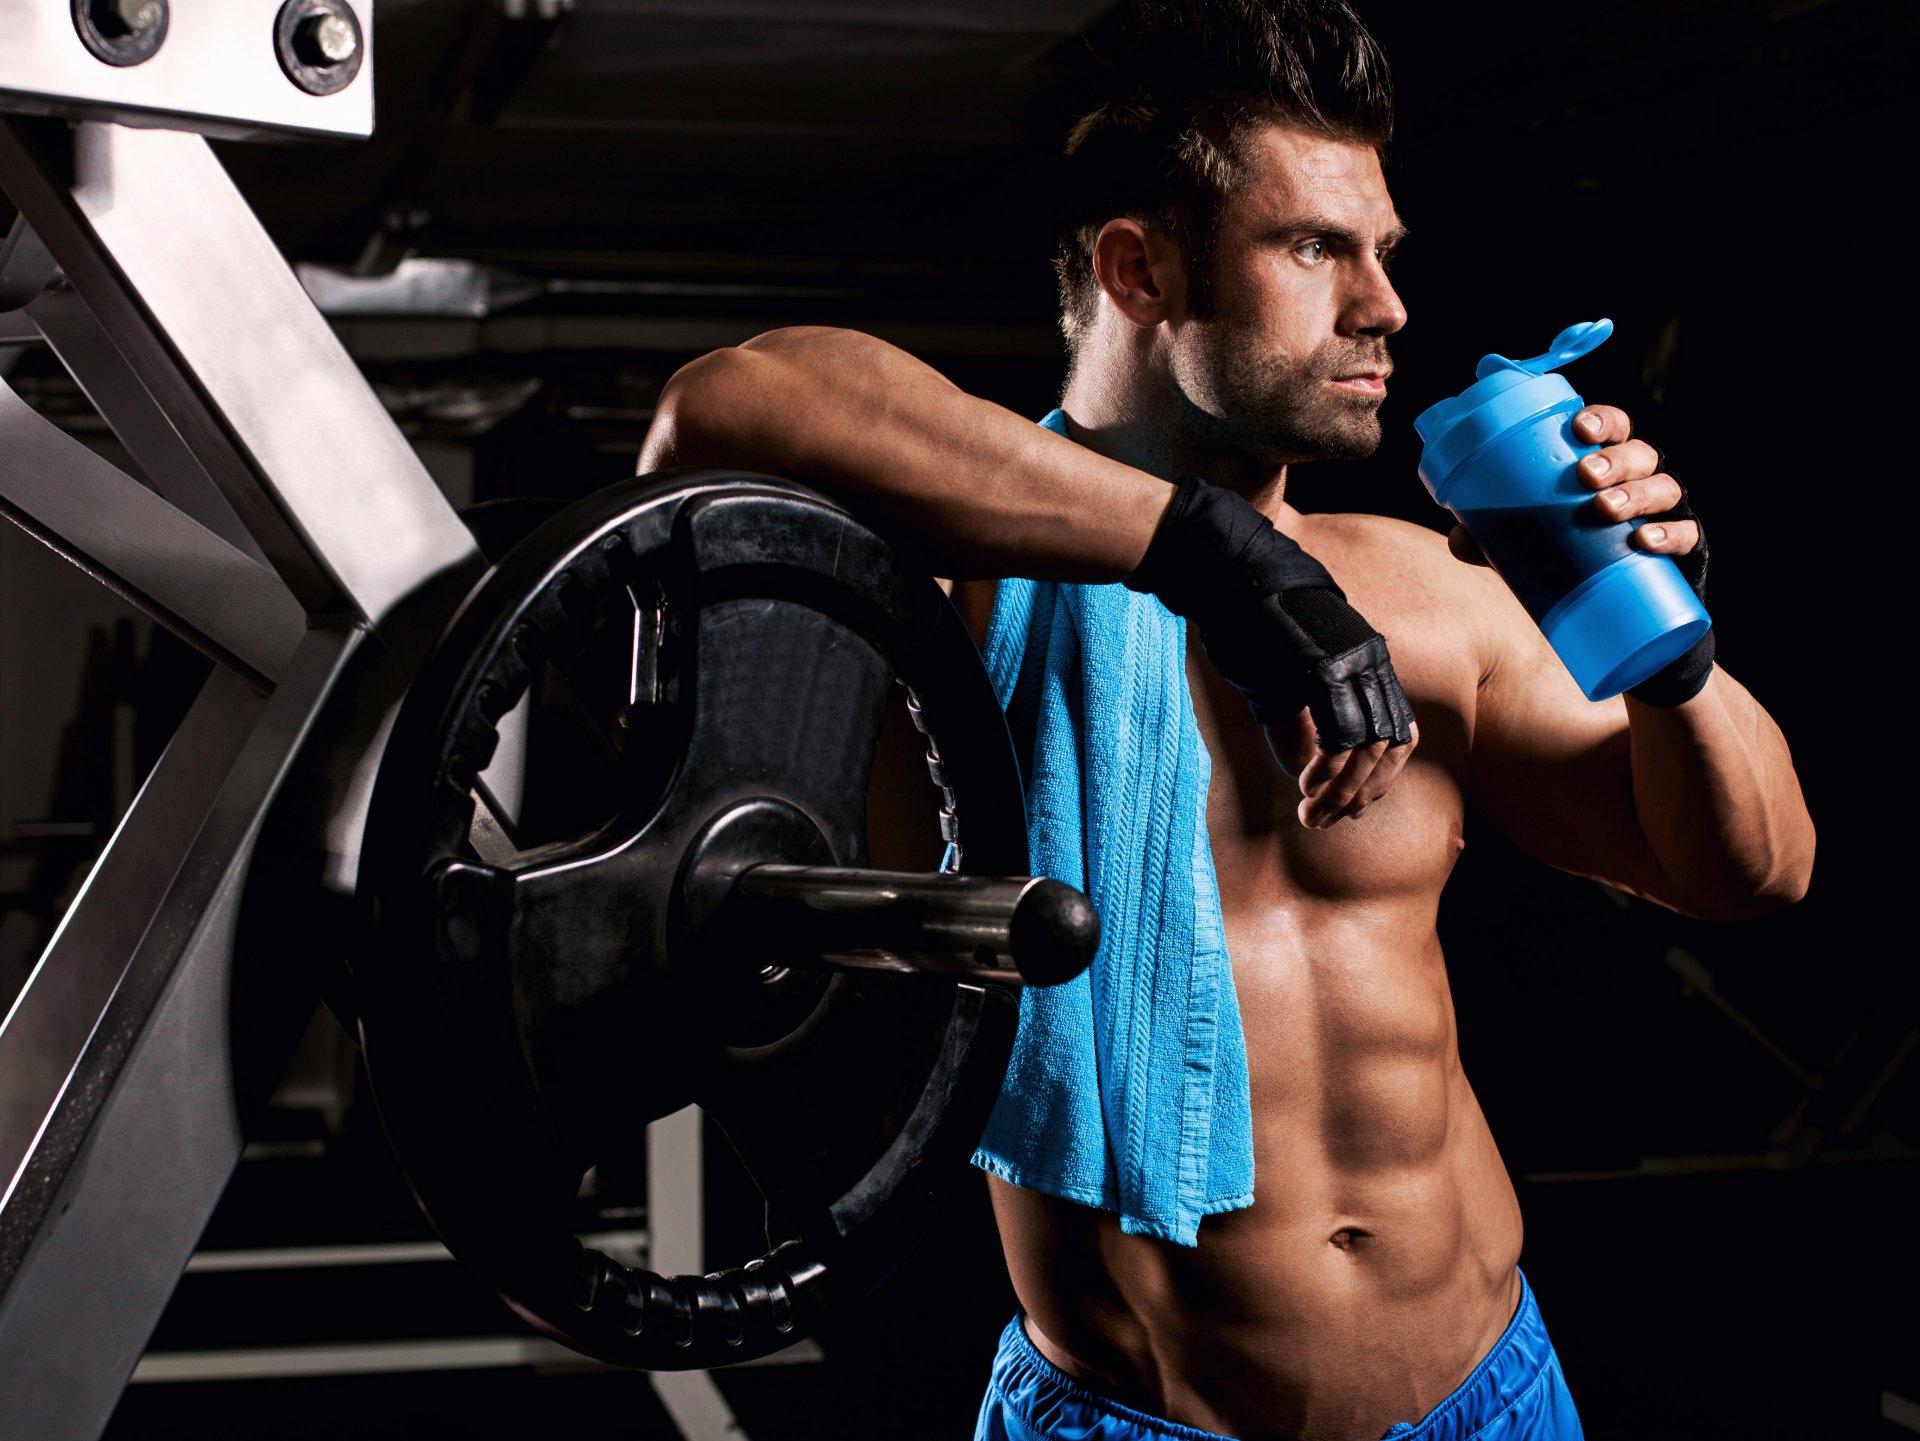 нее можно фотосессия для мужчин фитнес душу словосочетание матч